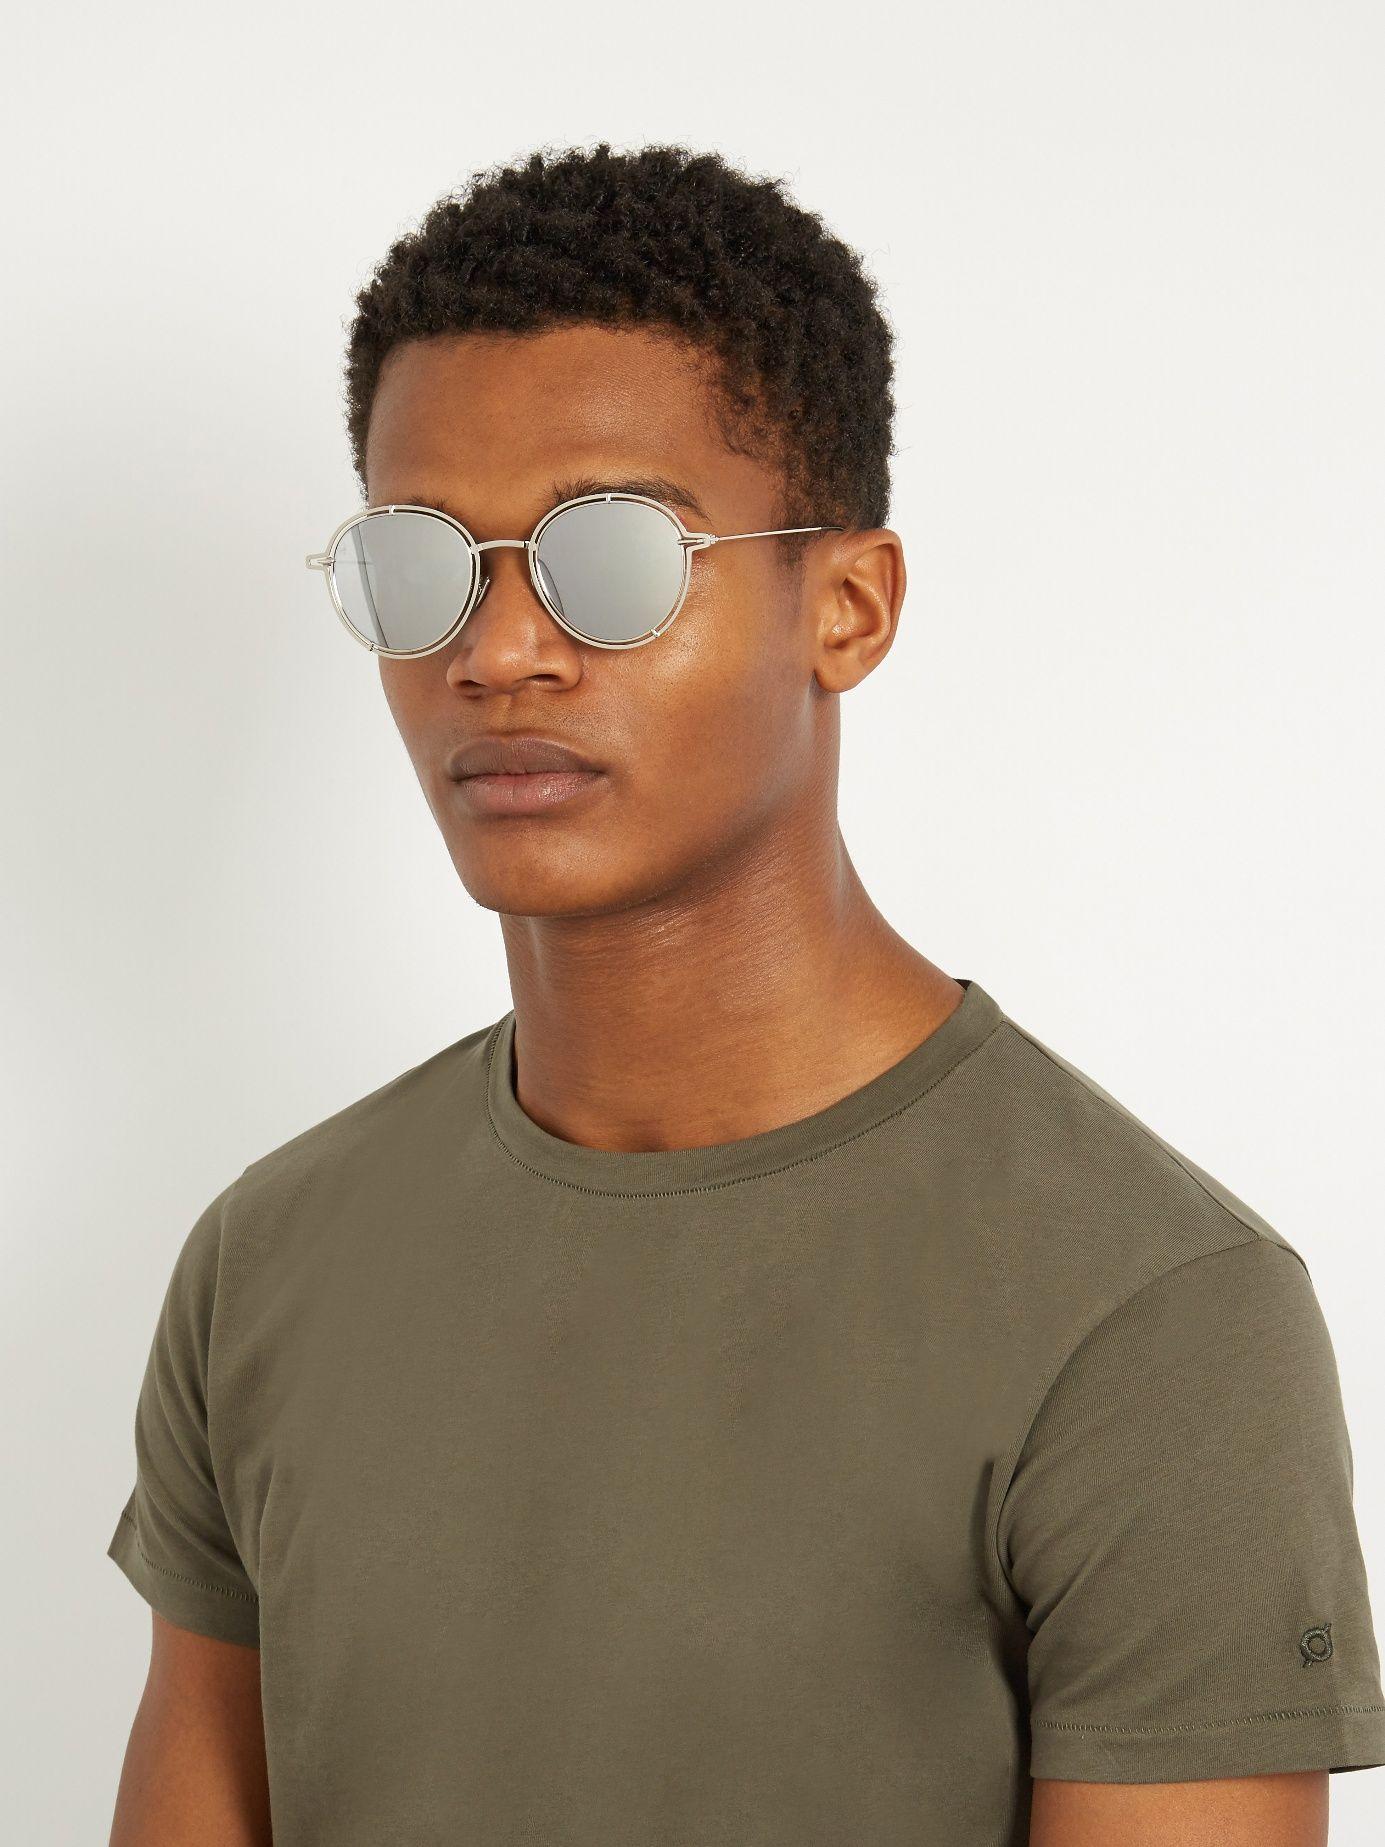 d8fe17b96f Dior0210S round-frame sunglasses